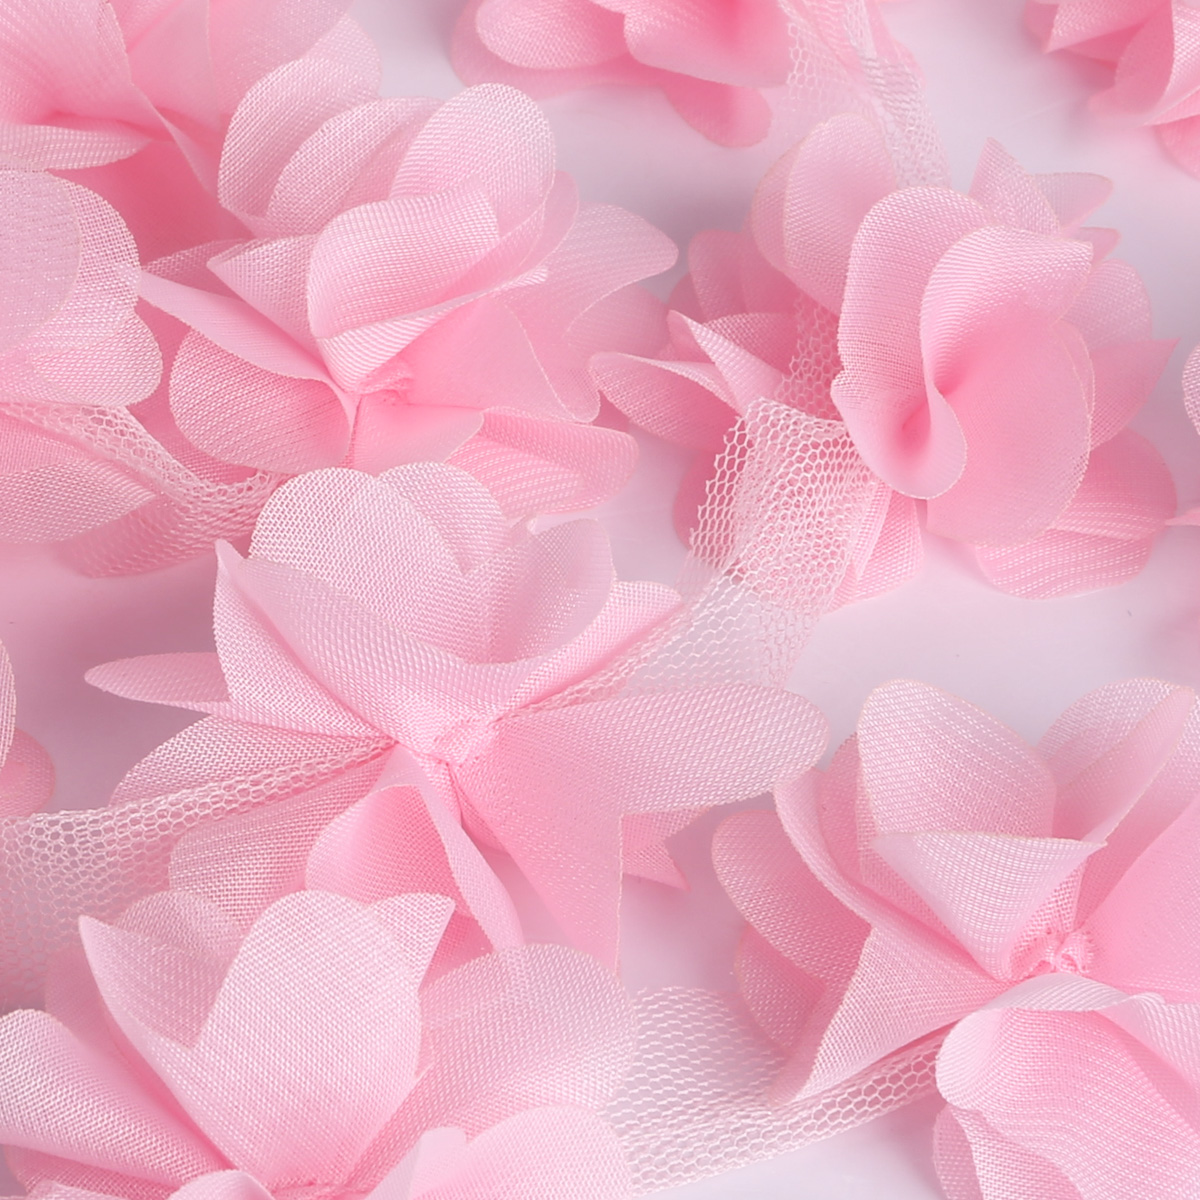 3d rosa blume spitze borte band kleid tasche spitzenborte. Black Bedroom Furniture Sets. Home Design Ideas